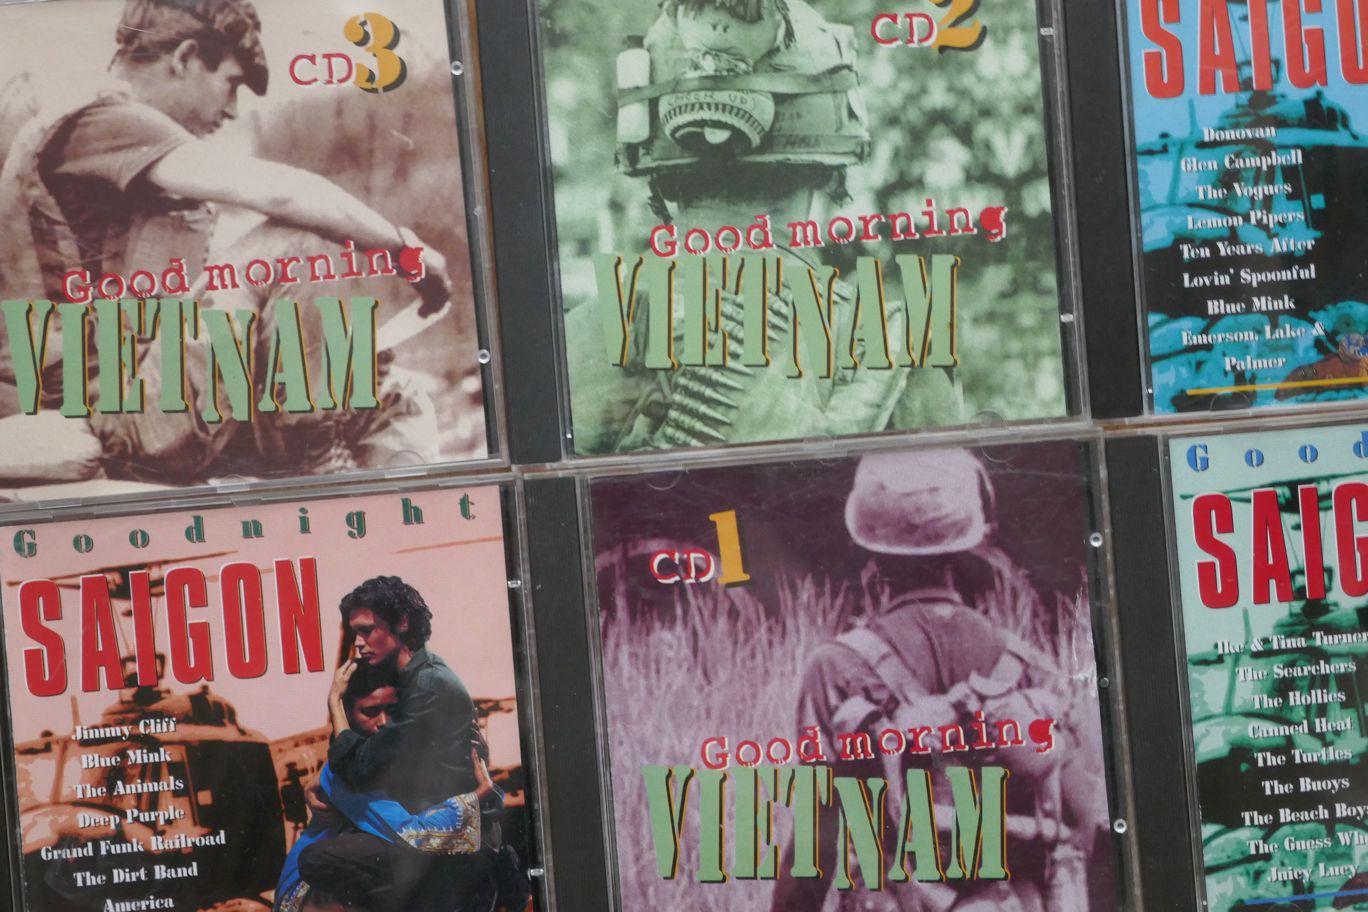 Hanoi - Geschichte - CD-Cover